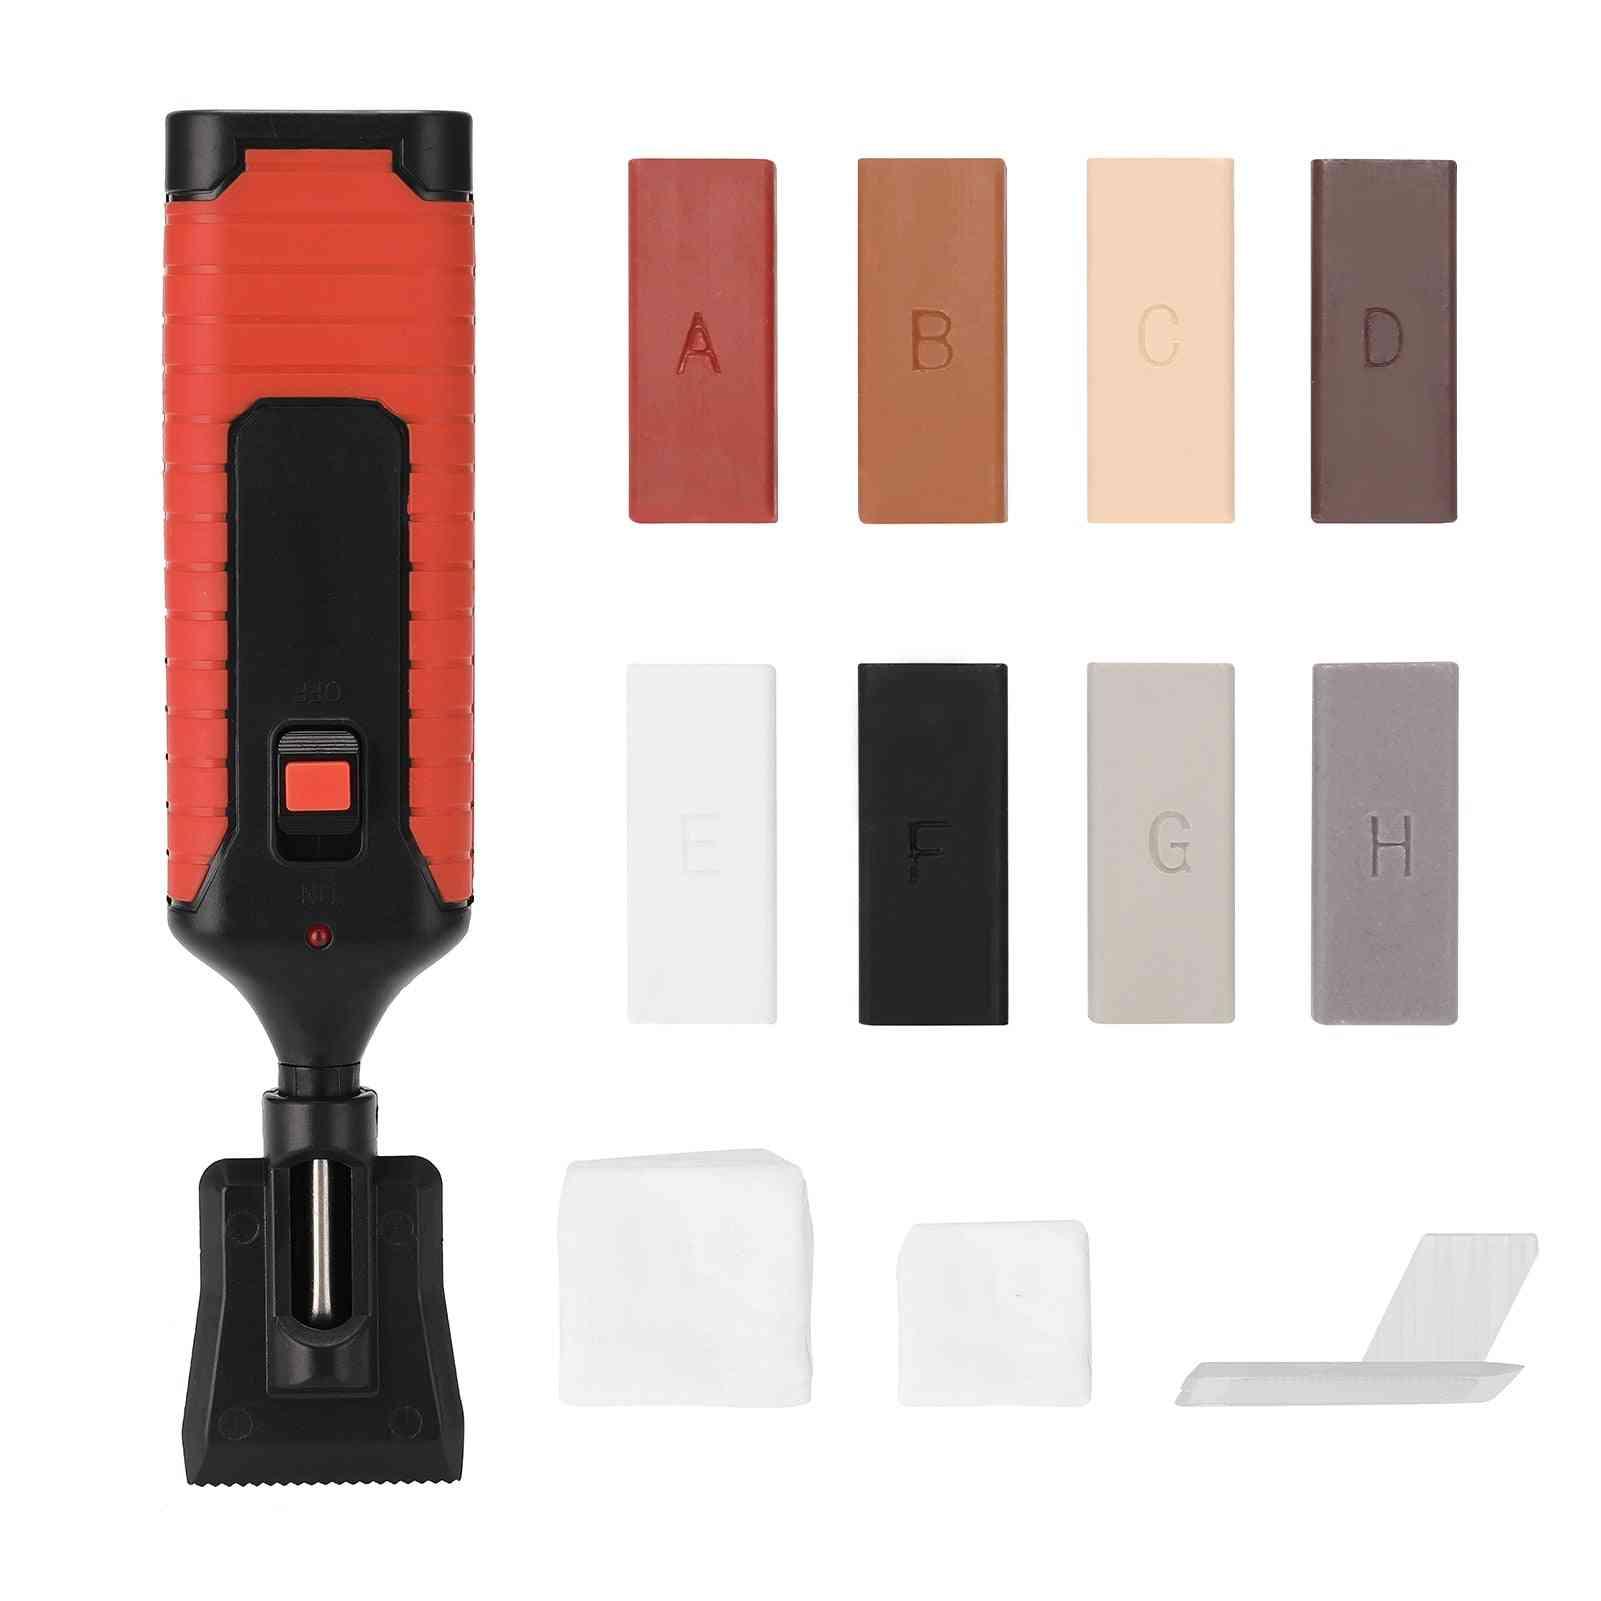 Ceramic Tile Repairing Tool Set Multifunction Diy Repairing Tool Set Household Home Tools Convenient Labor Saving Fill Tile (repairing Set)